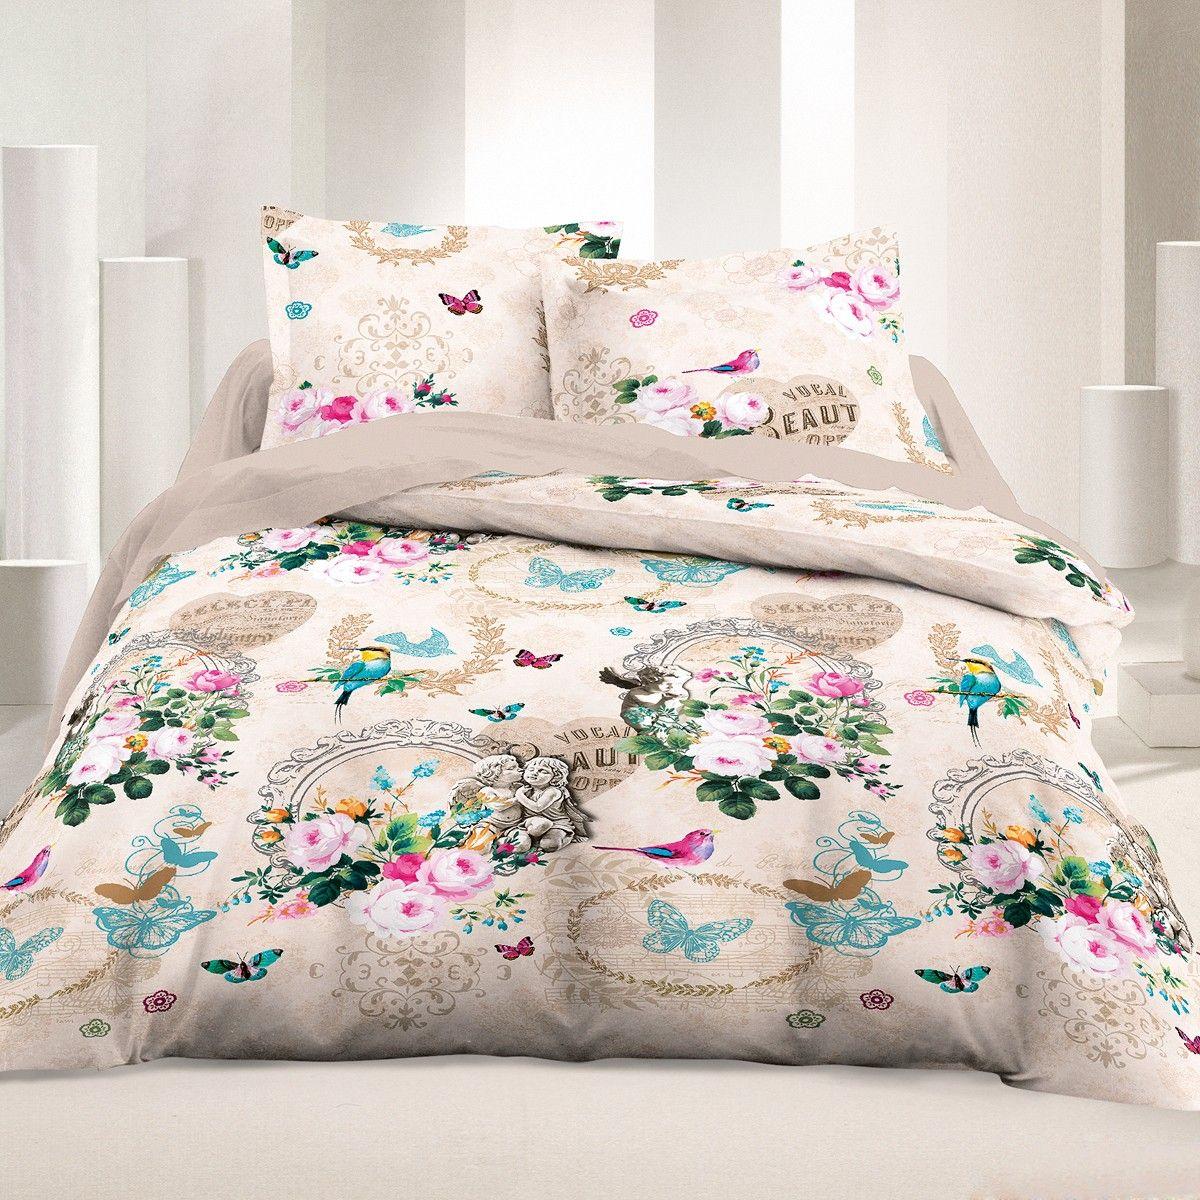 Wonderful Ornella   Bed Linen Set, 100% Cotton ...